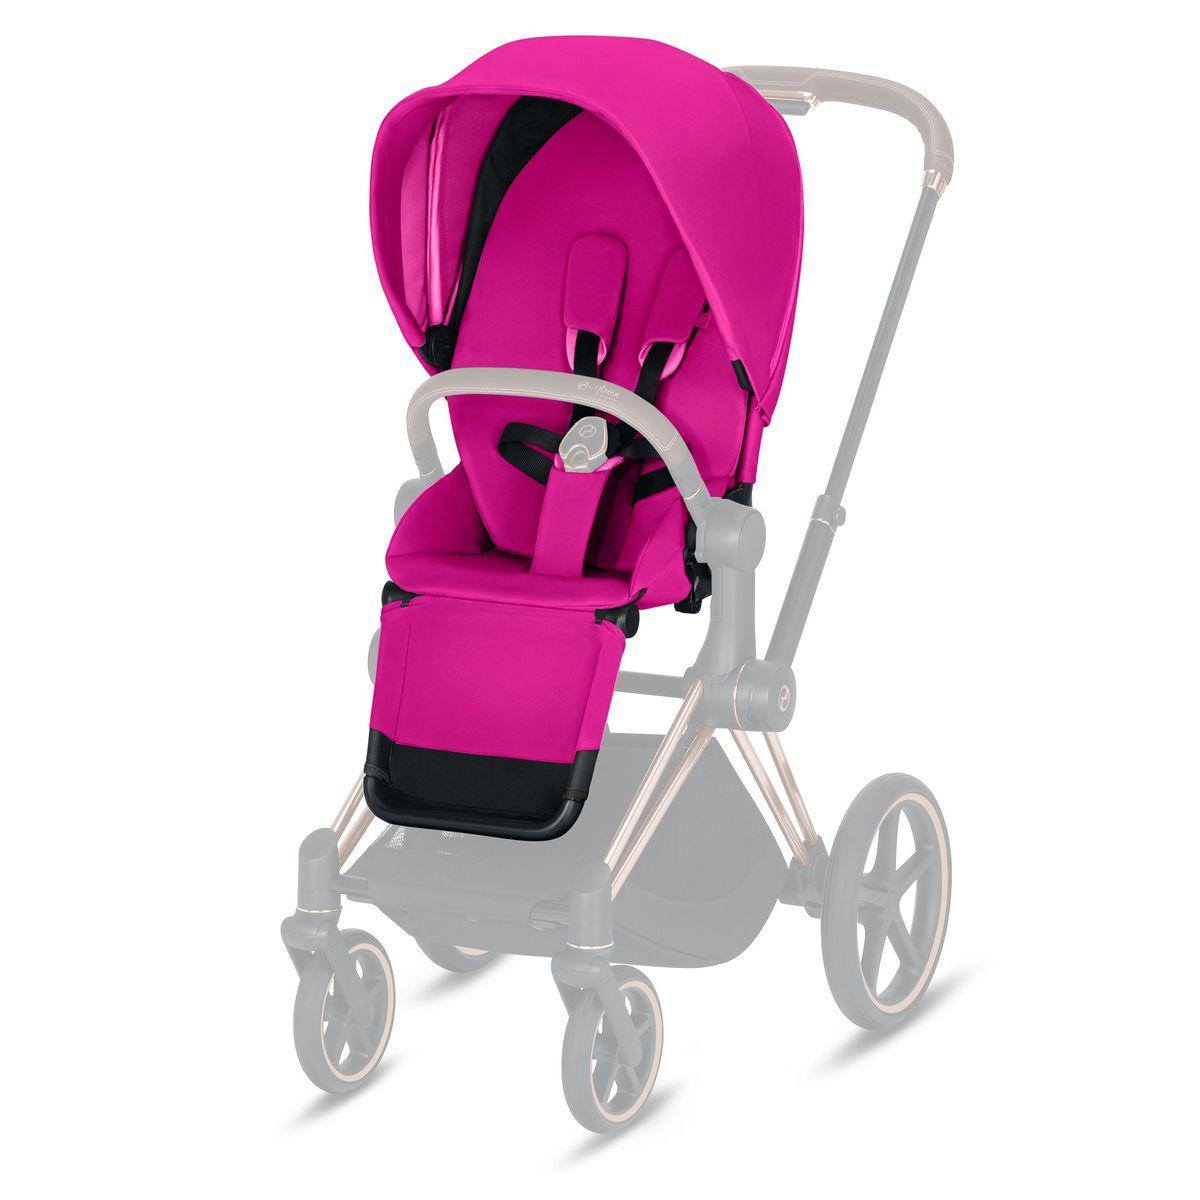 Asiento-pack silla PRIAM Cybex fancy pink-purple